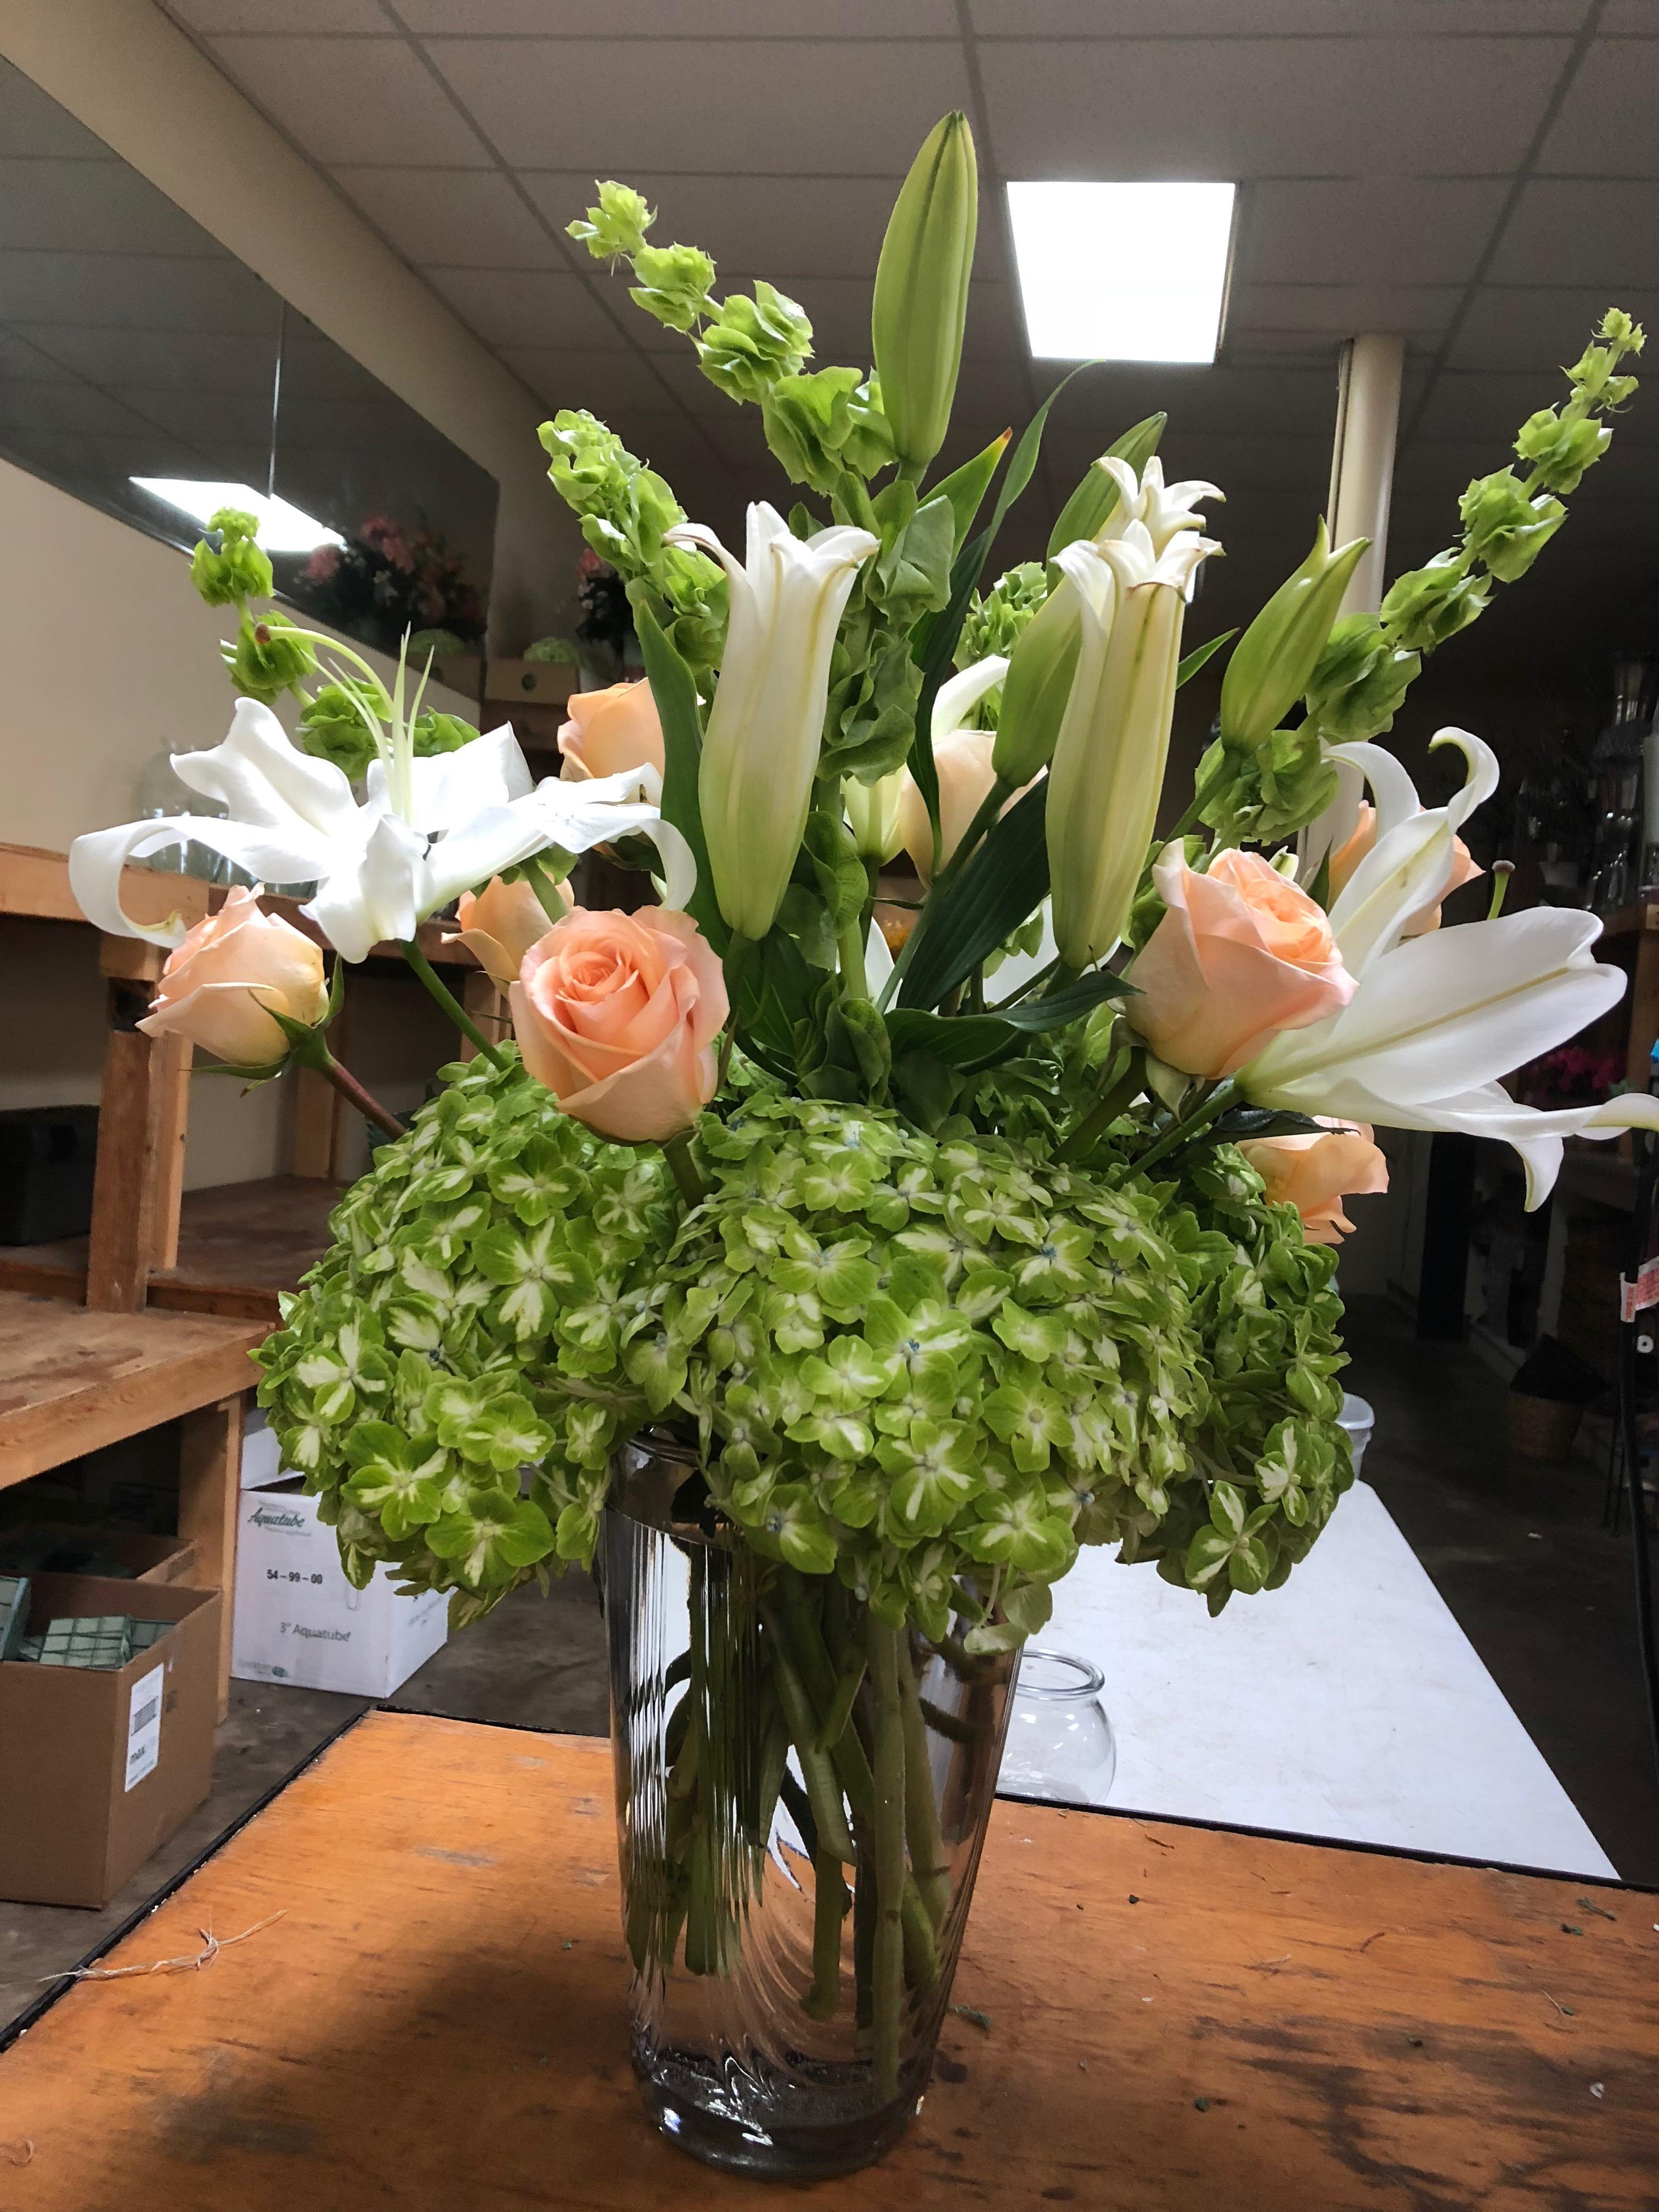 Pat's Florist And Gourmet Baskets Inc image 5